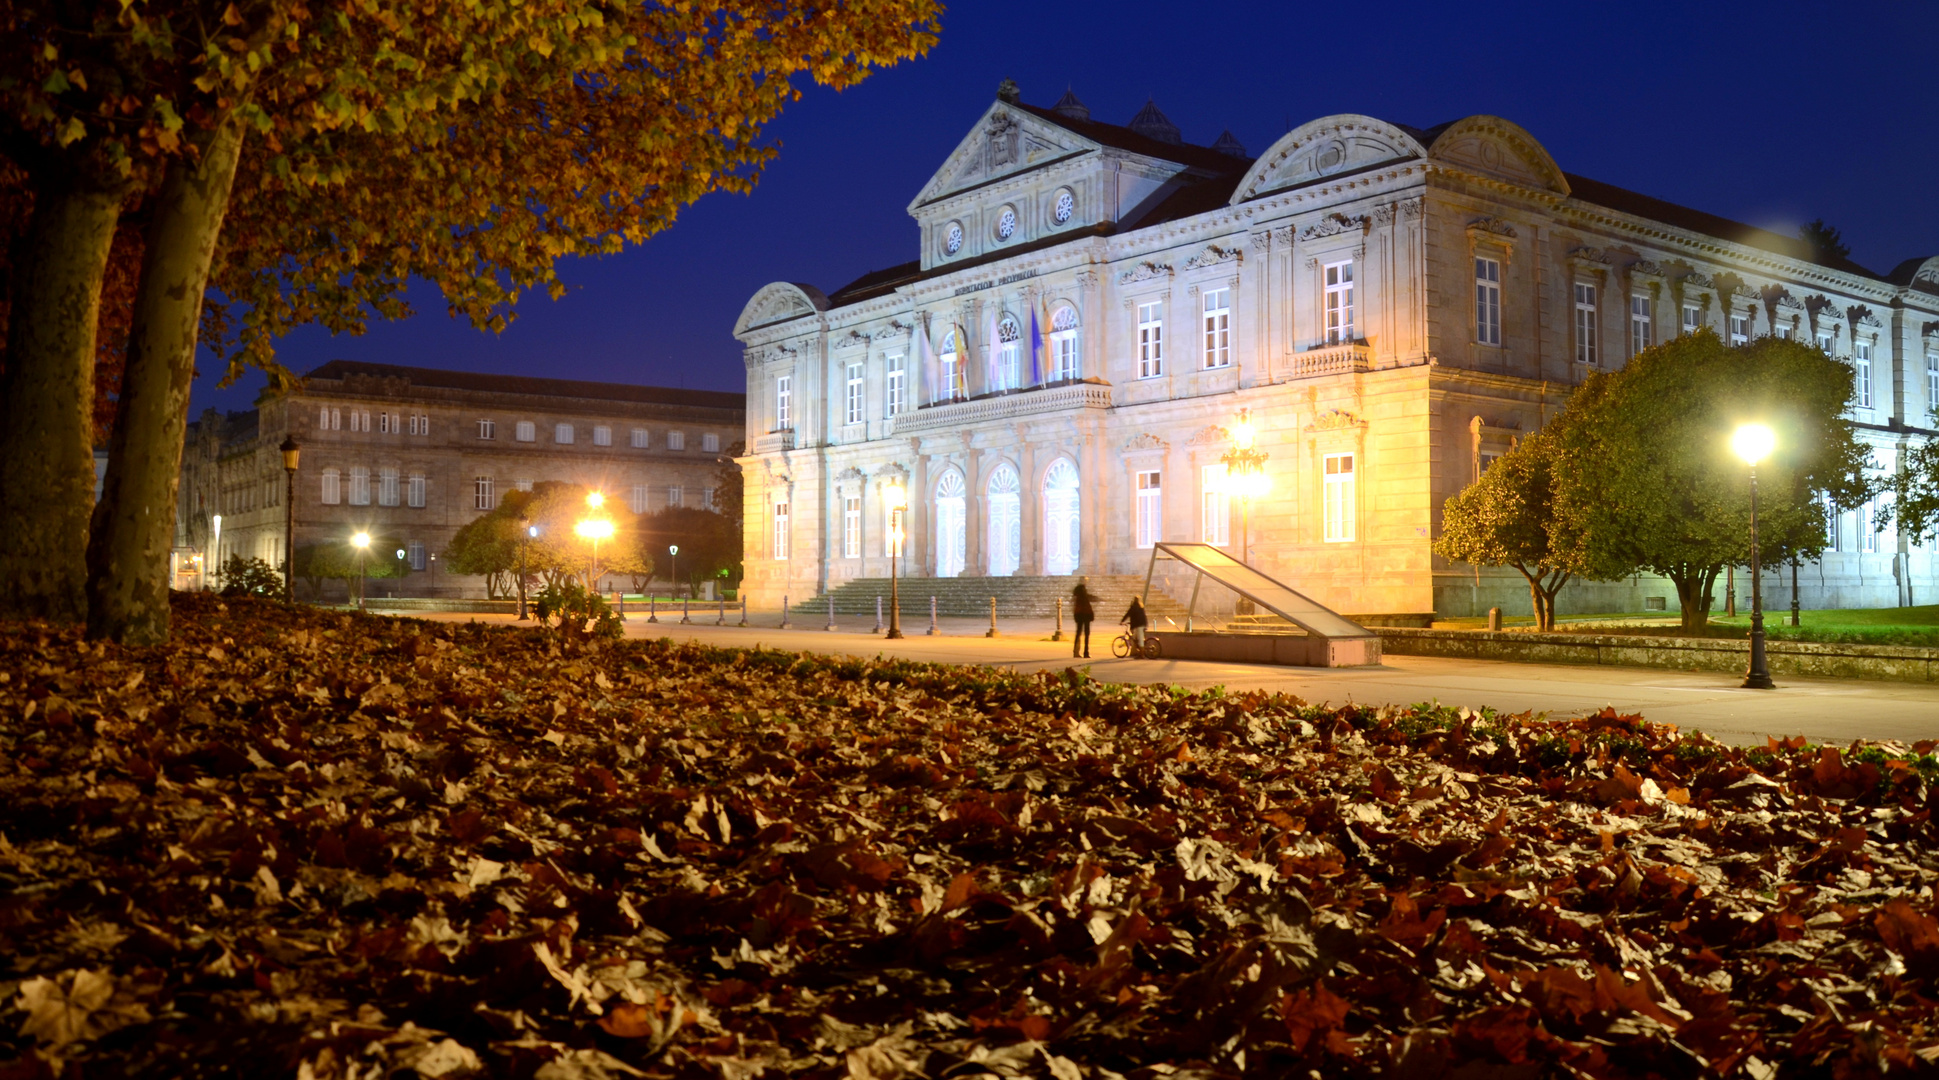 Pontevedra la nuit